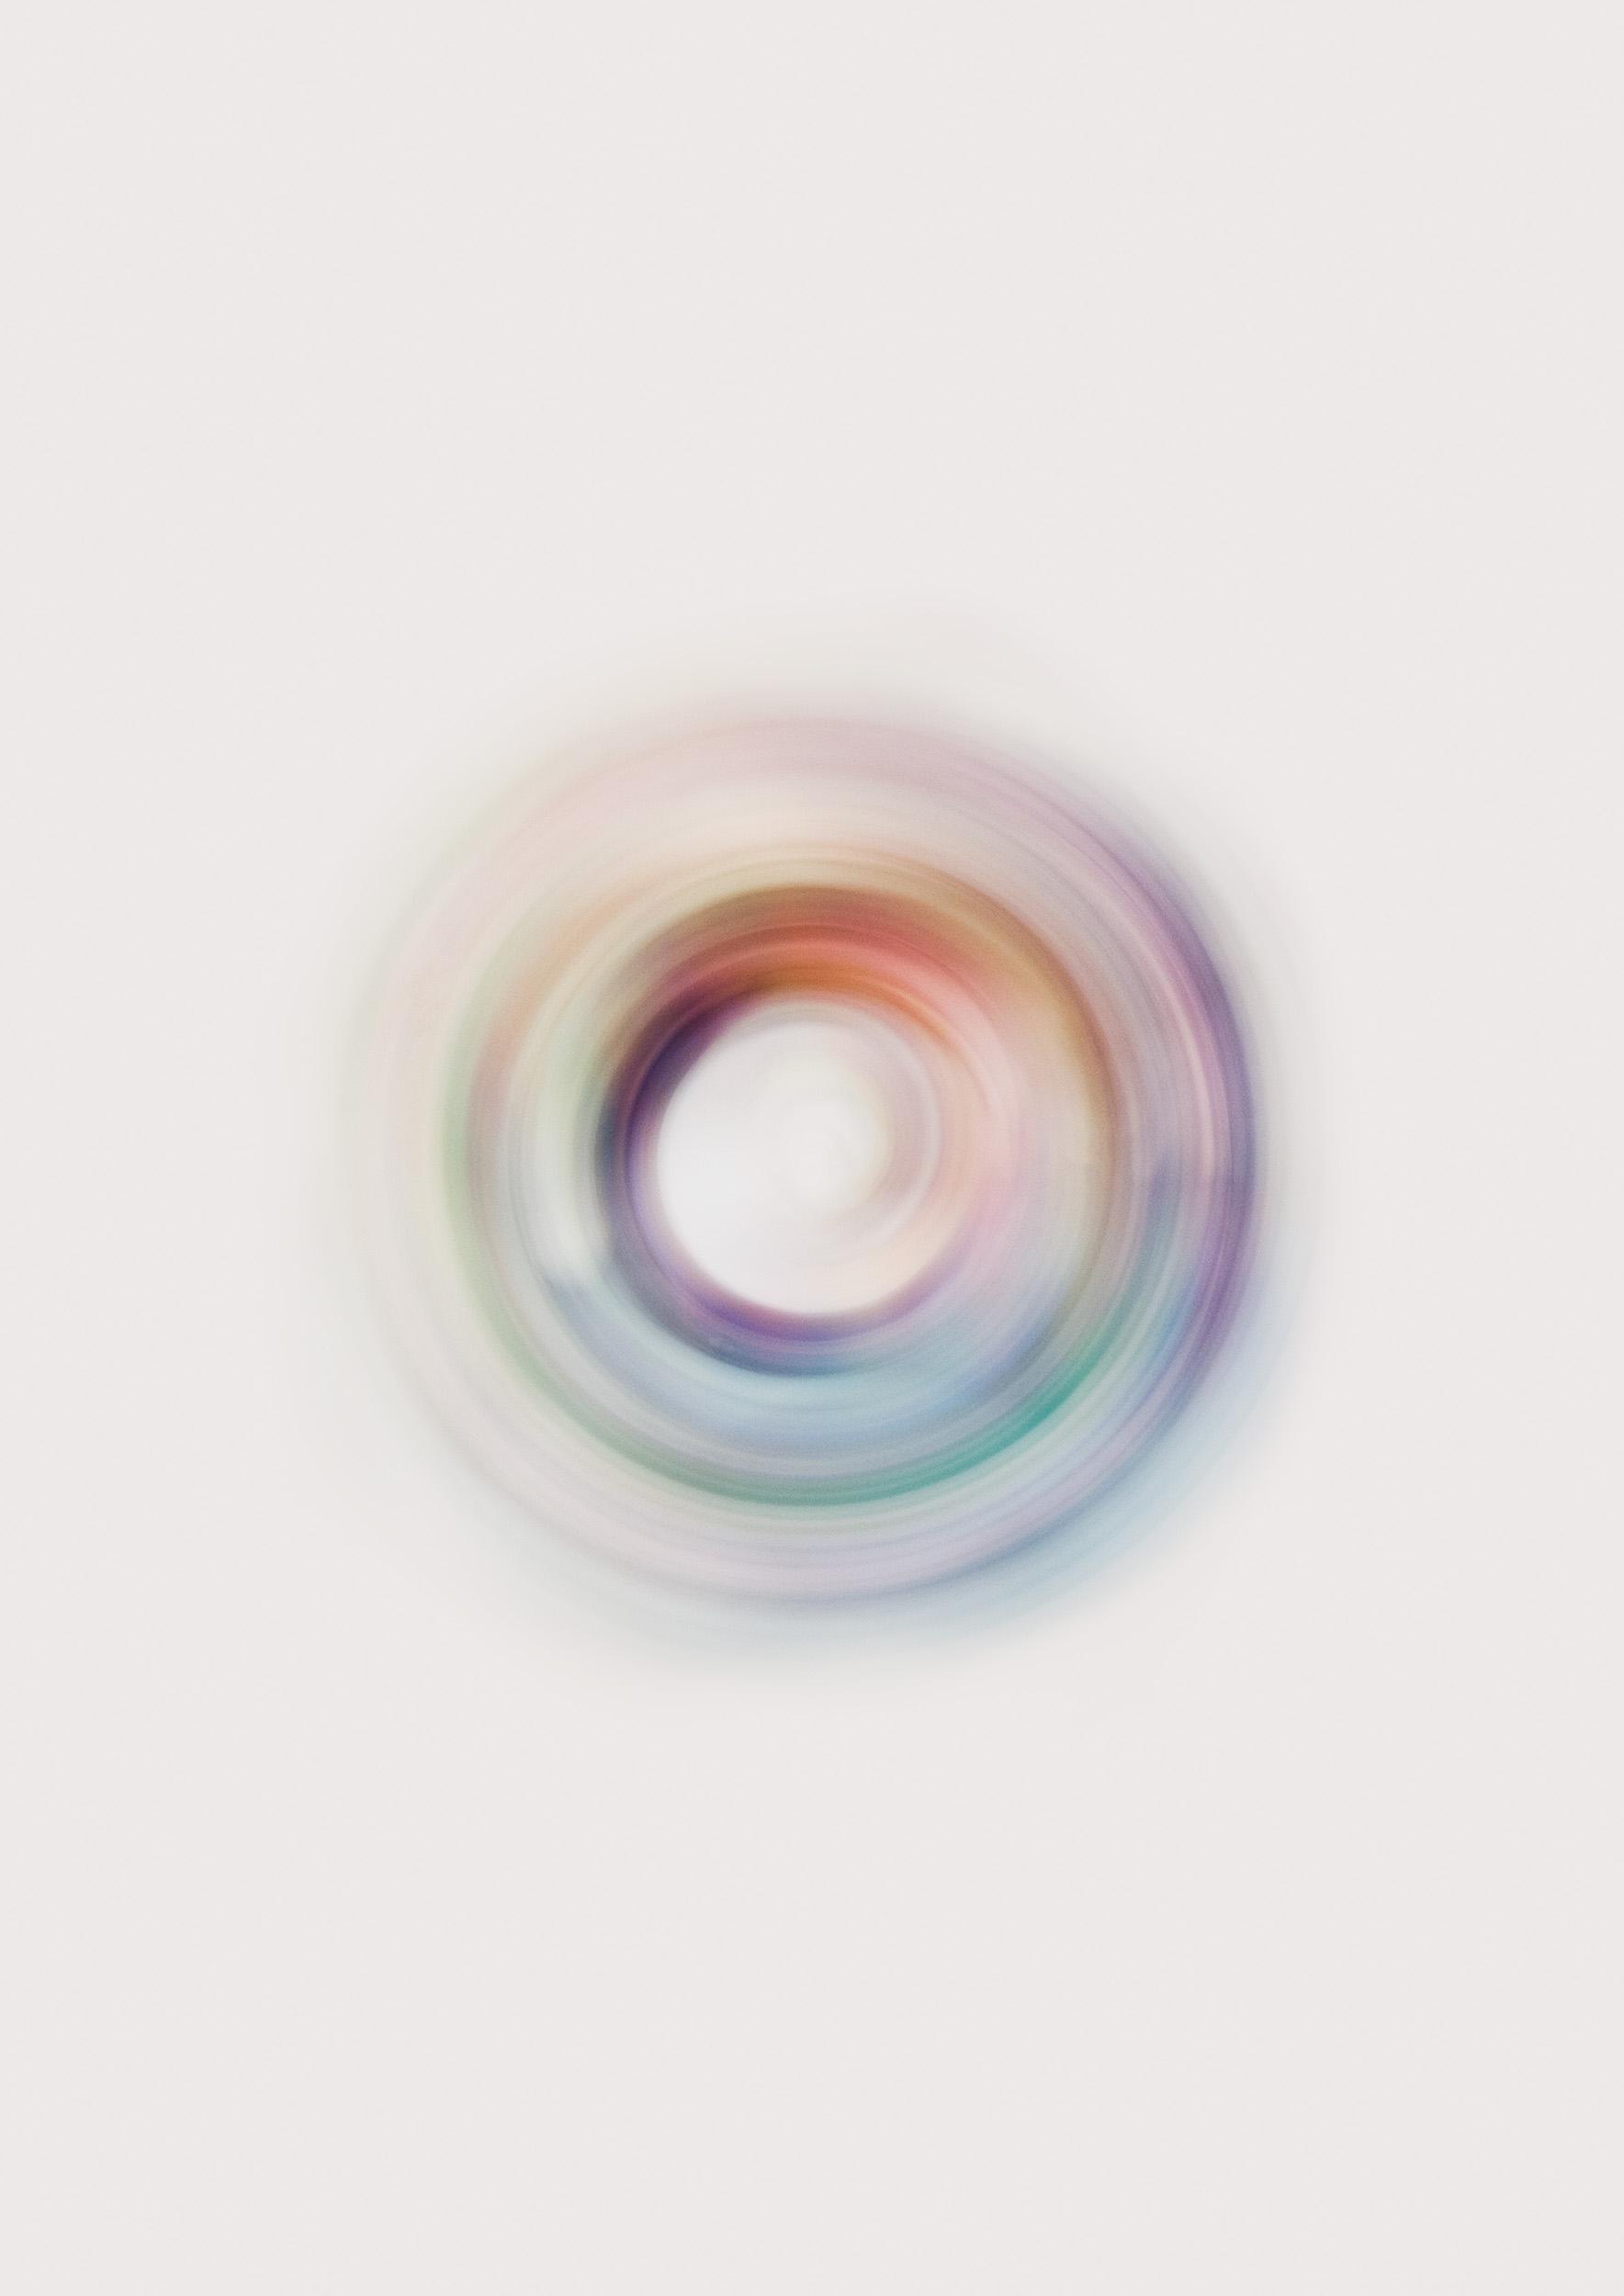 Farben_3.jpg